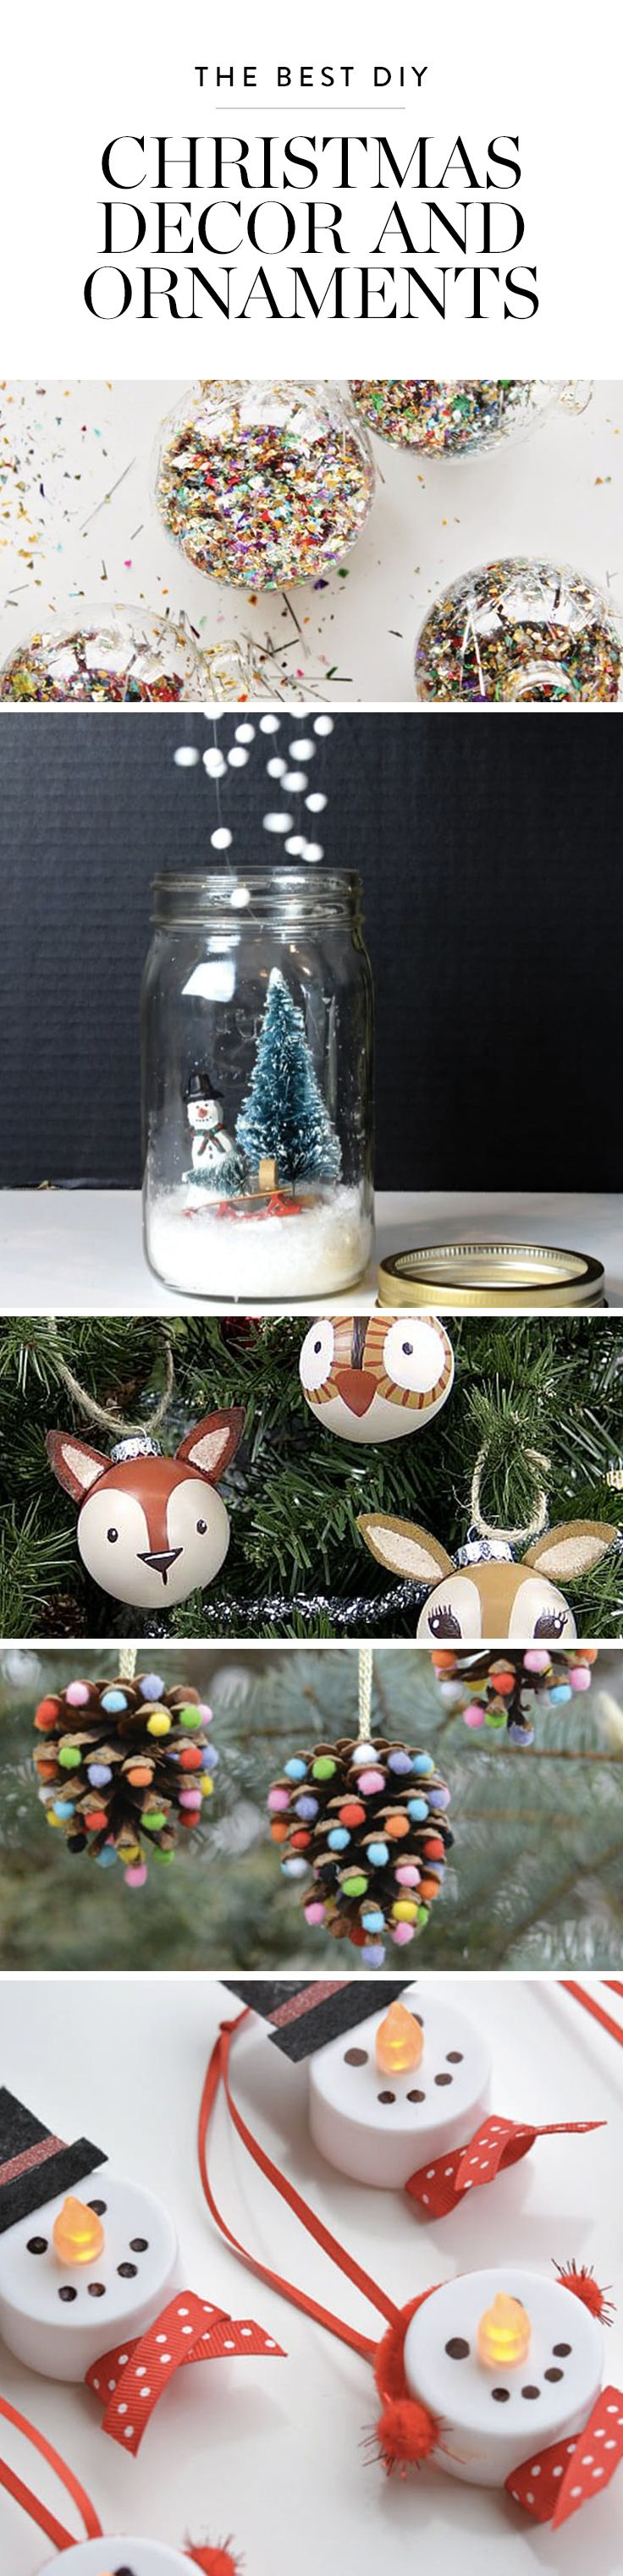 Pretty Christmas Decor and Ornaments You Can Make Yourself  Grandparents, De...